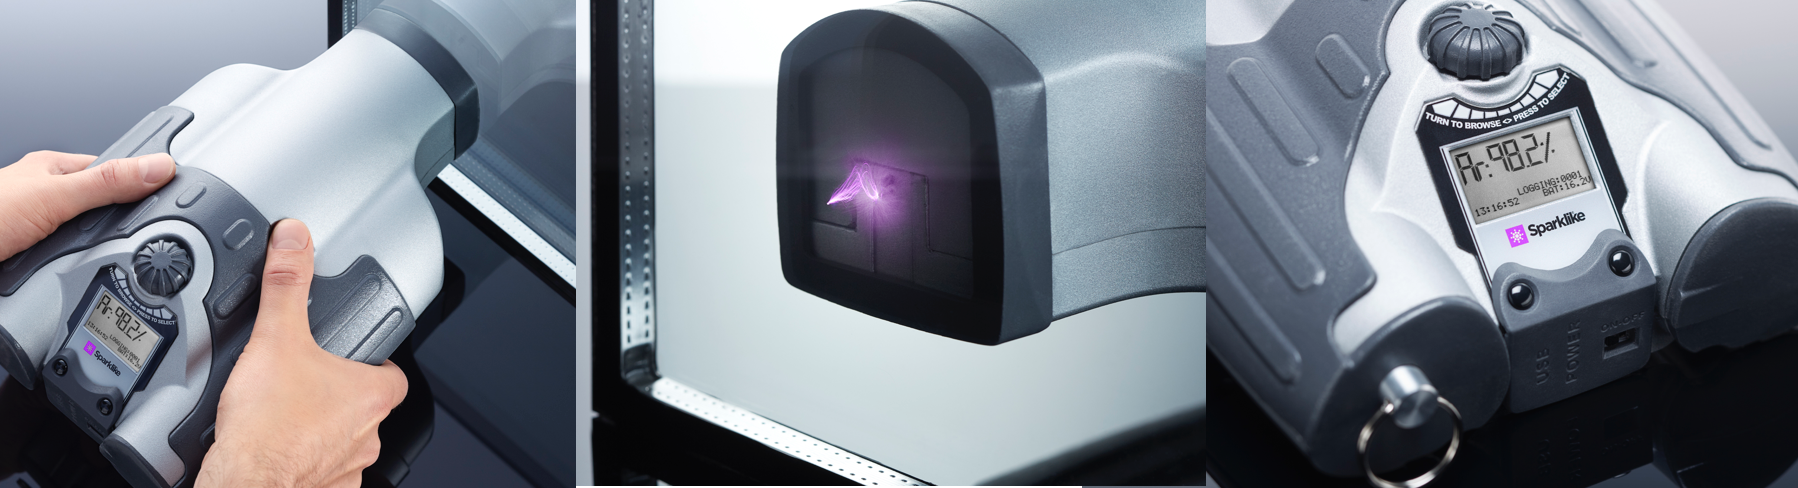 Sparklike Handheld for non-destructive insulating glass gas fill analysis for standard double glazed IGU's